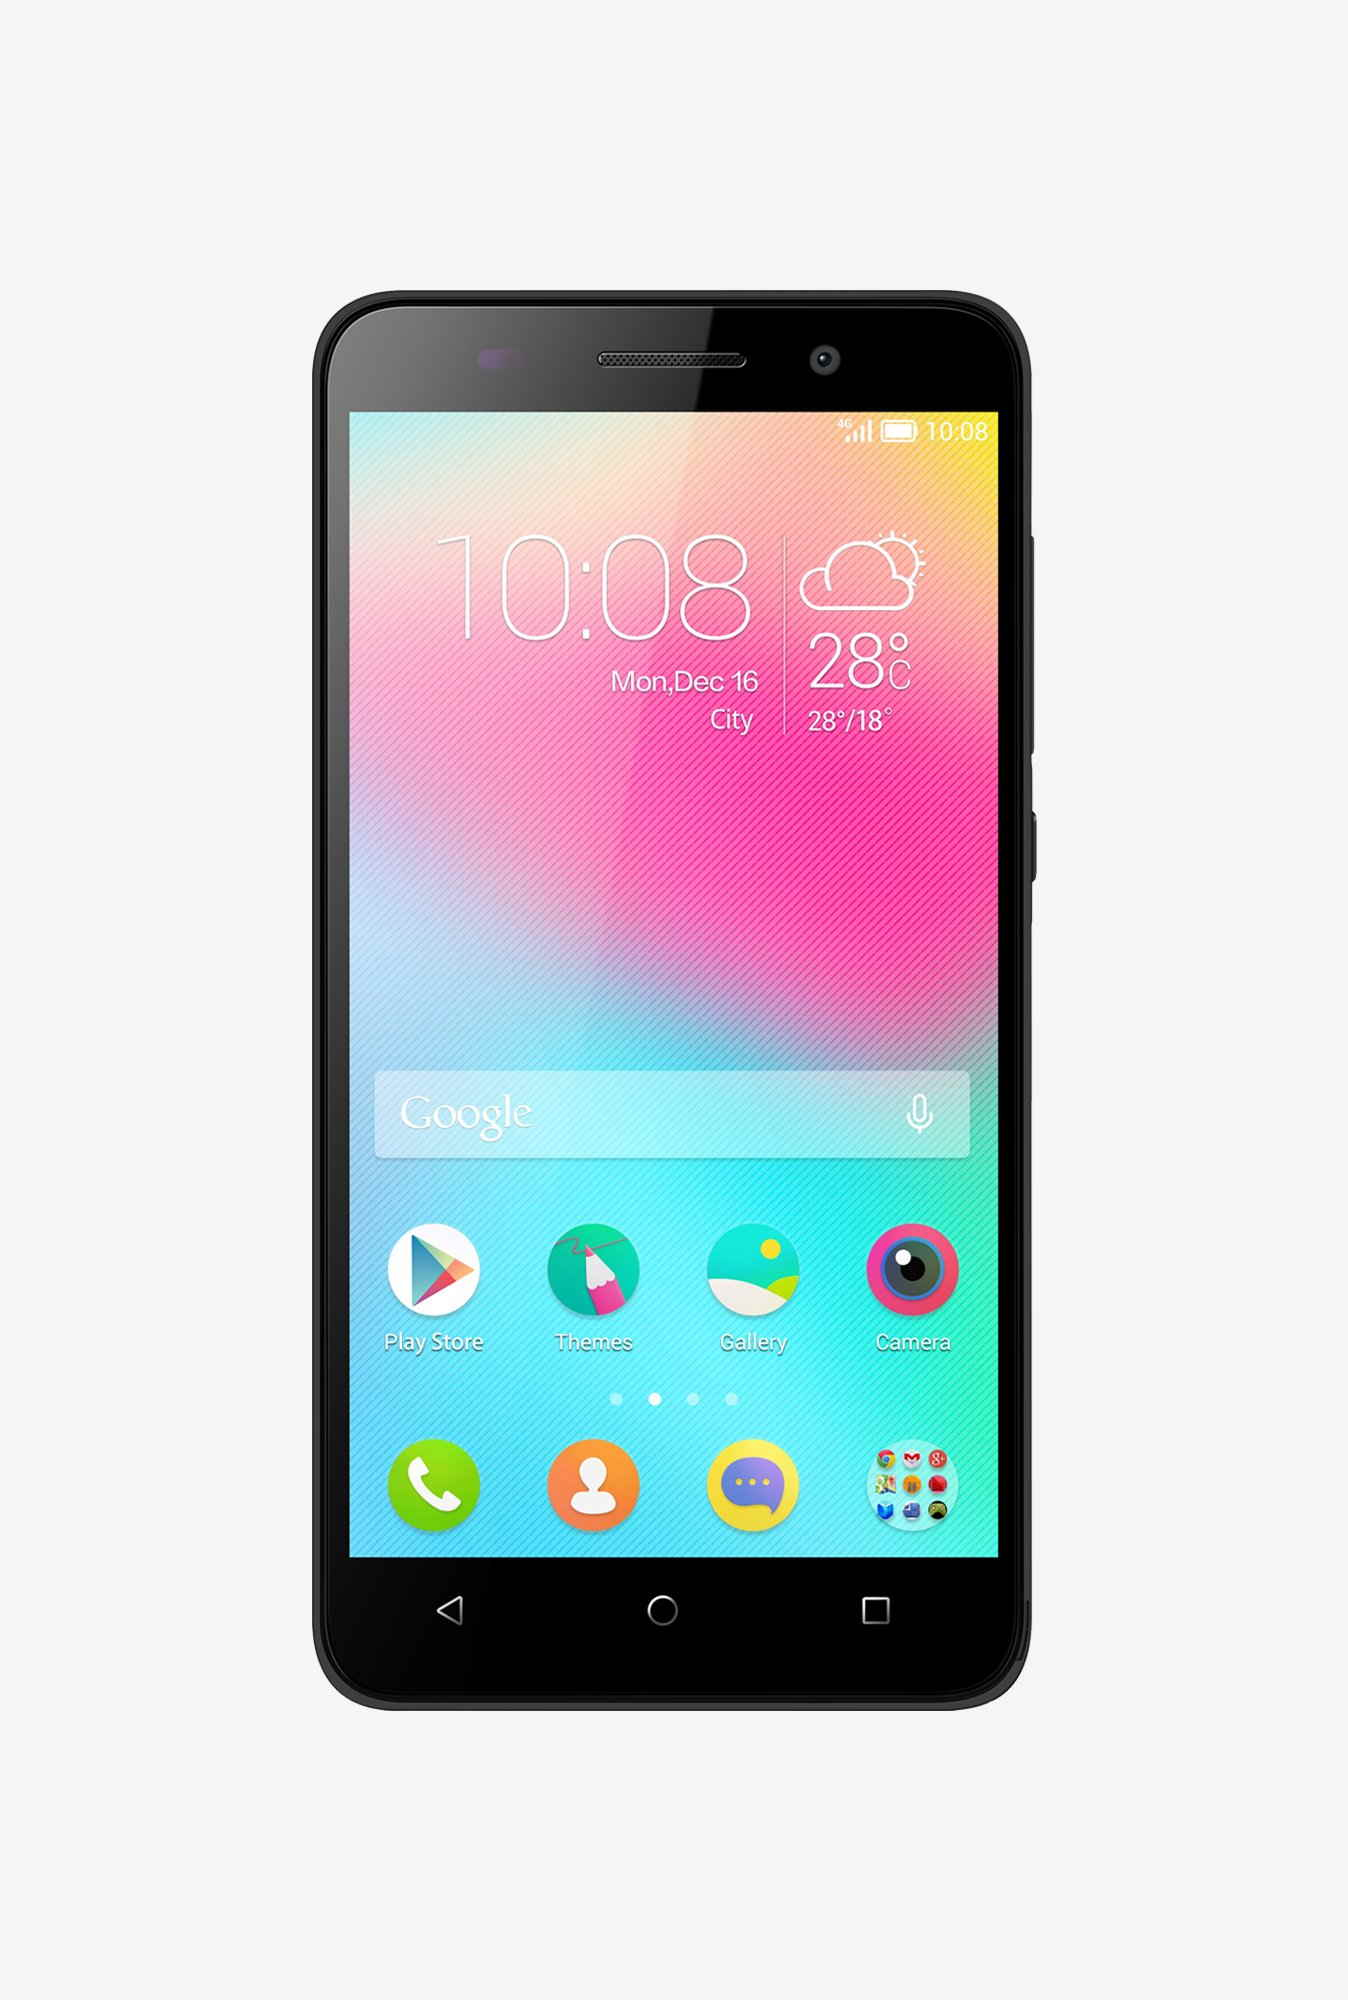 Honor 4X 8GB Black Mobile